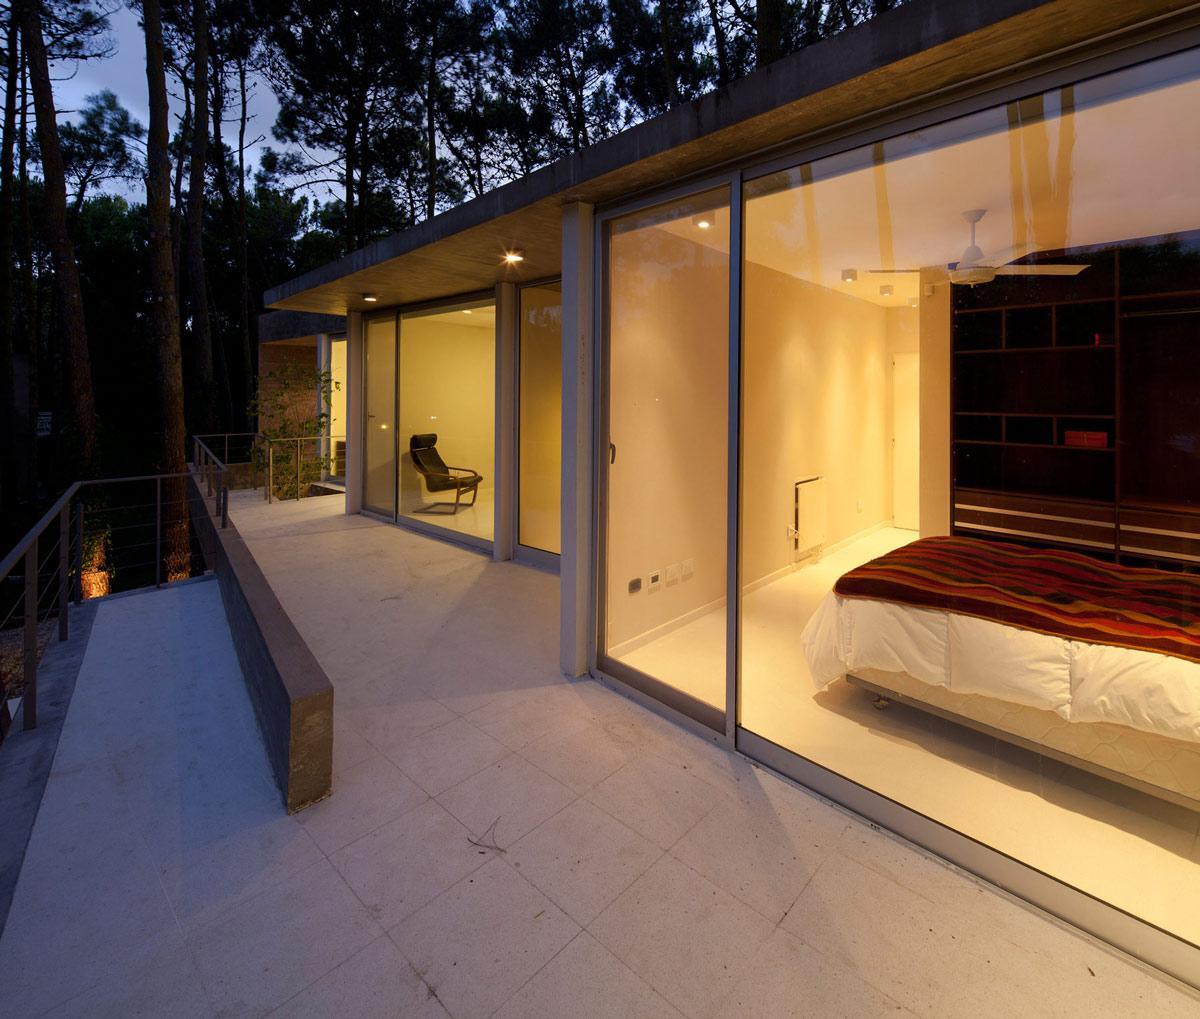 Balcony, Patio Doors, Bedroom, Modern Concrete House in Cariló, Argentina